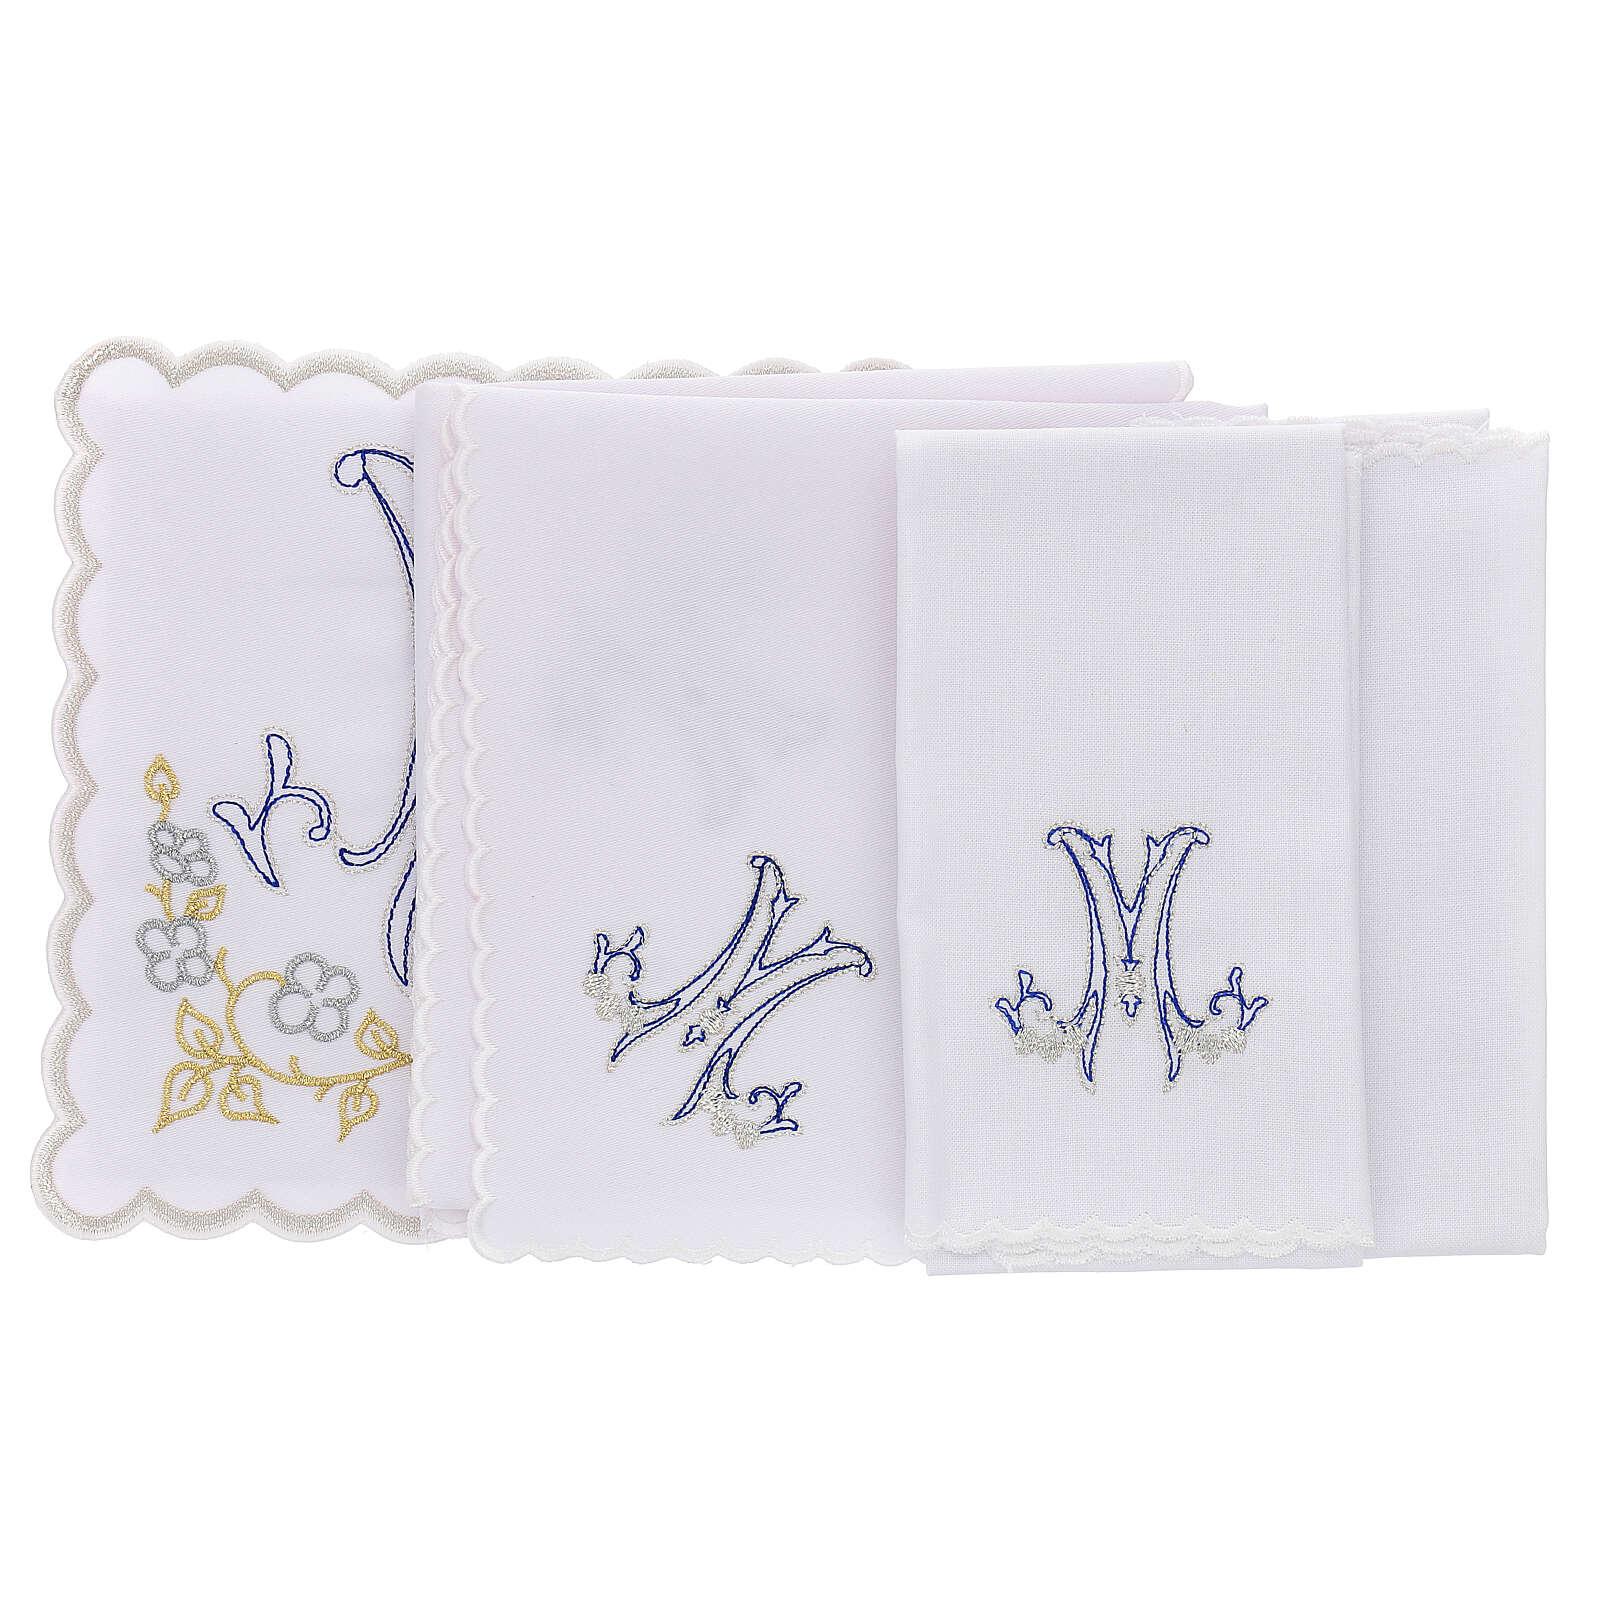 Altar linen blue embroidery Marian symbol, cotton 4